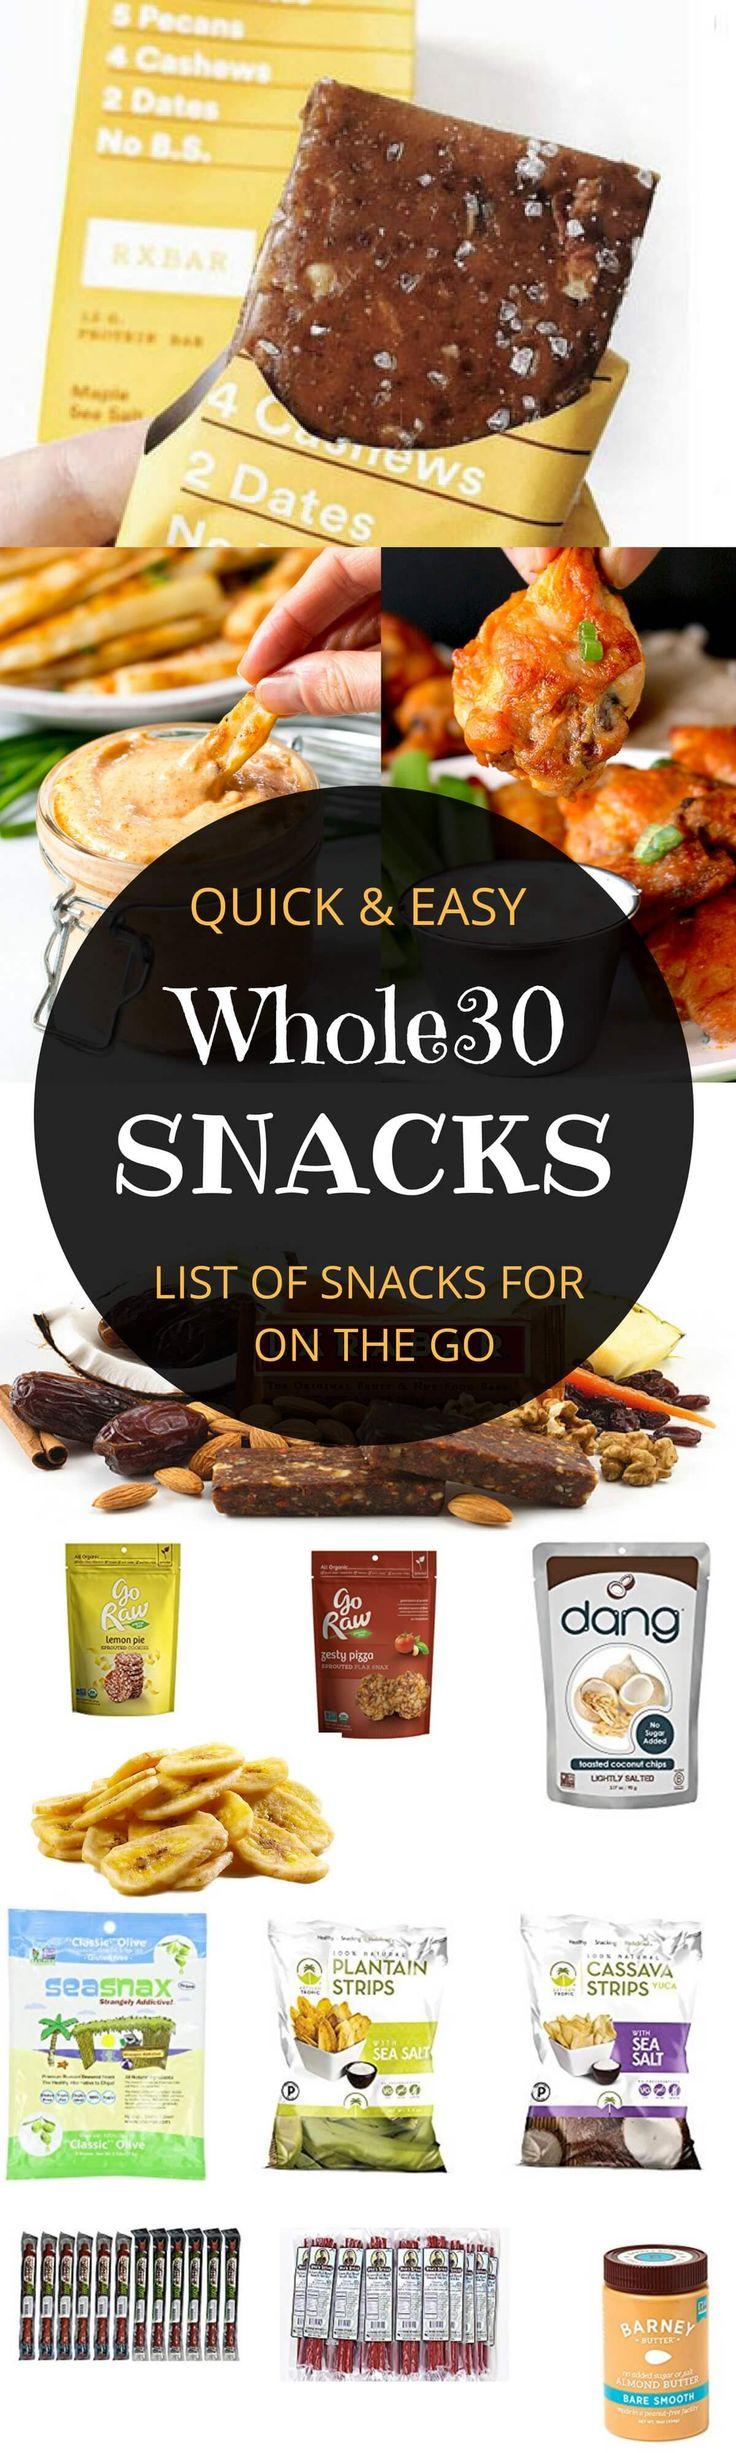 whole30 snacks on the go //